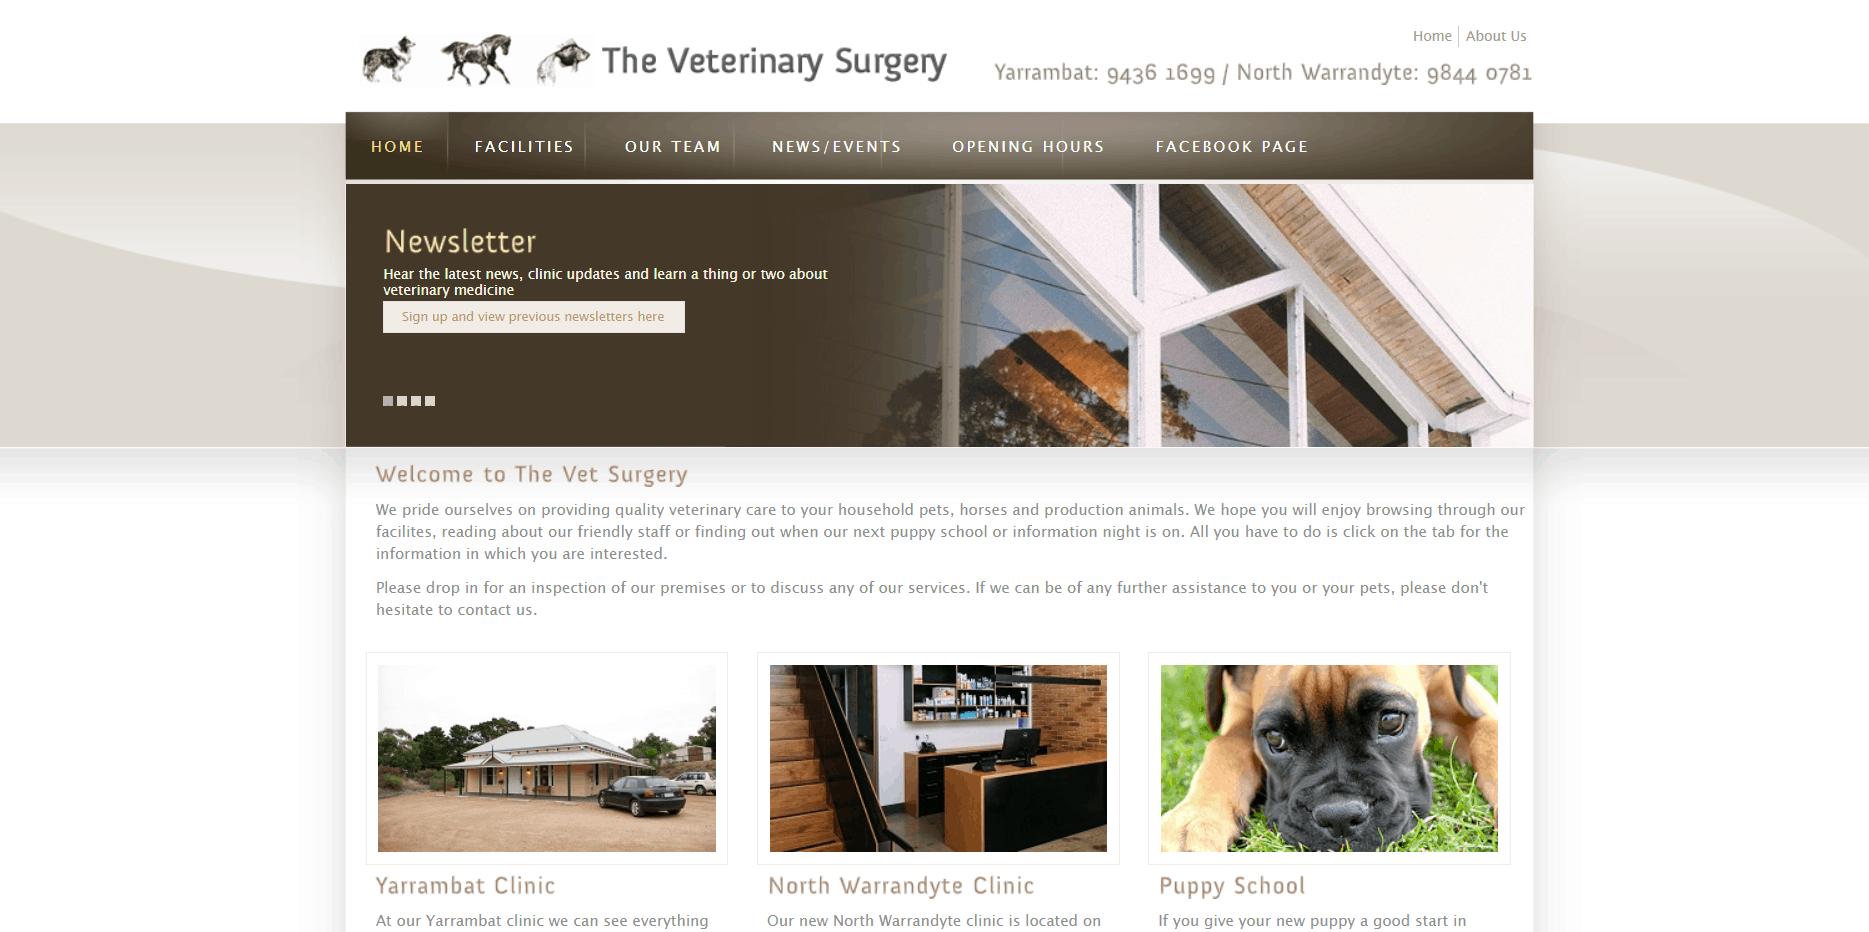 The Veterinary Surgery